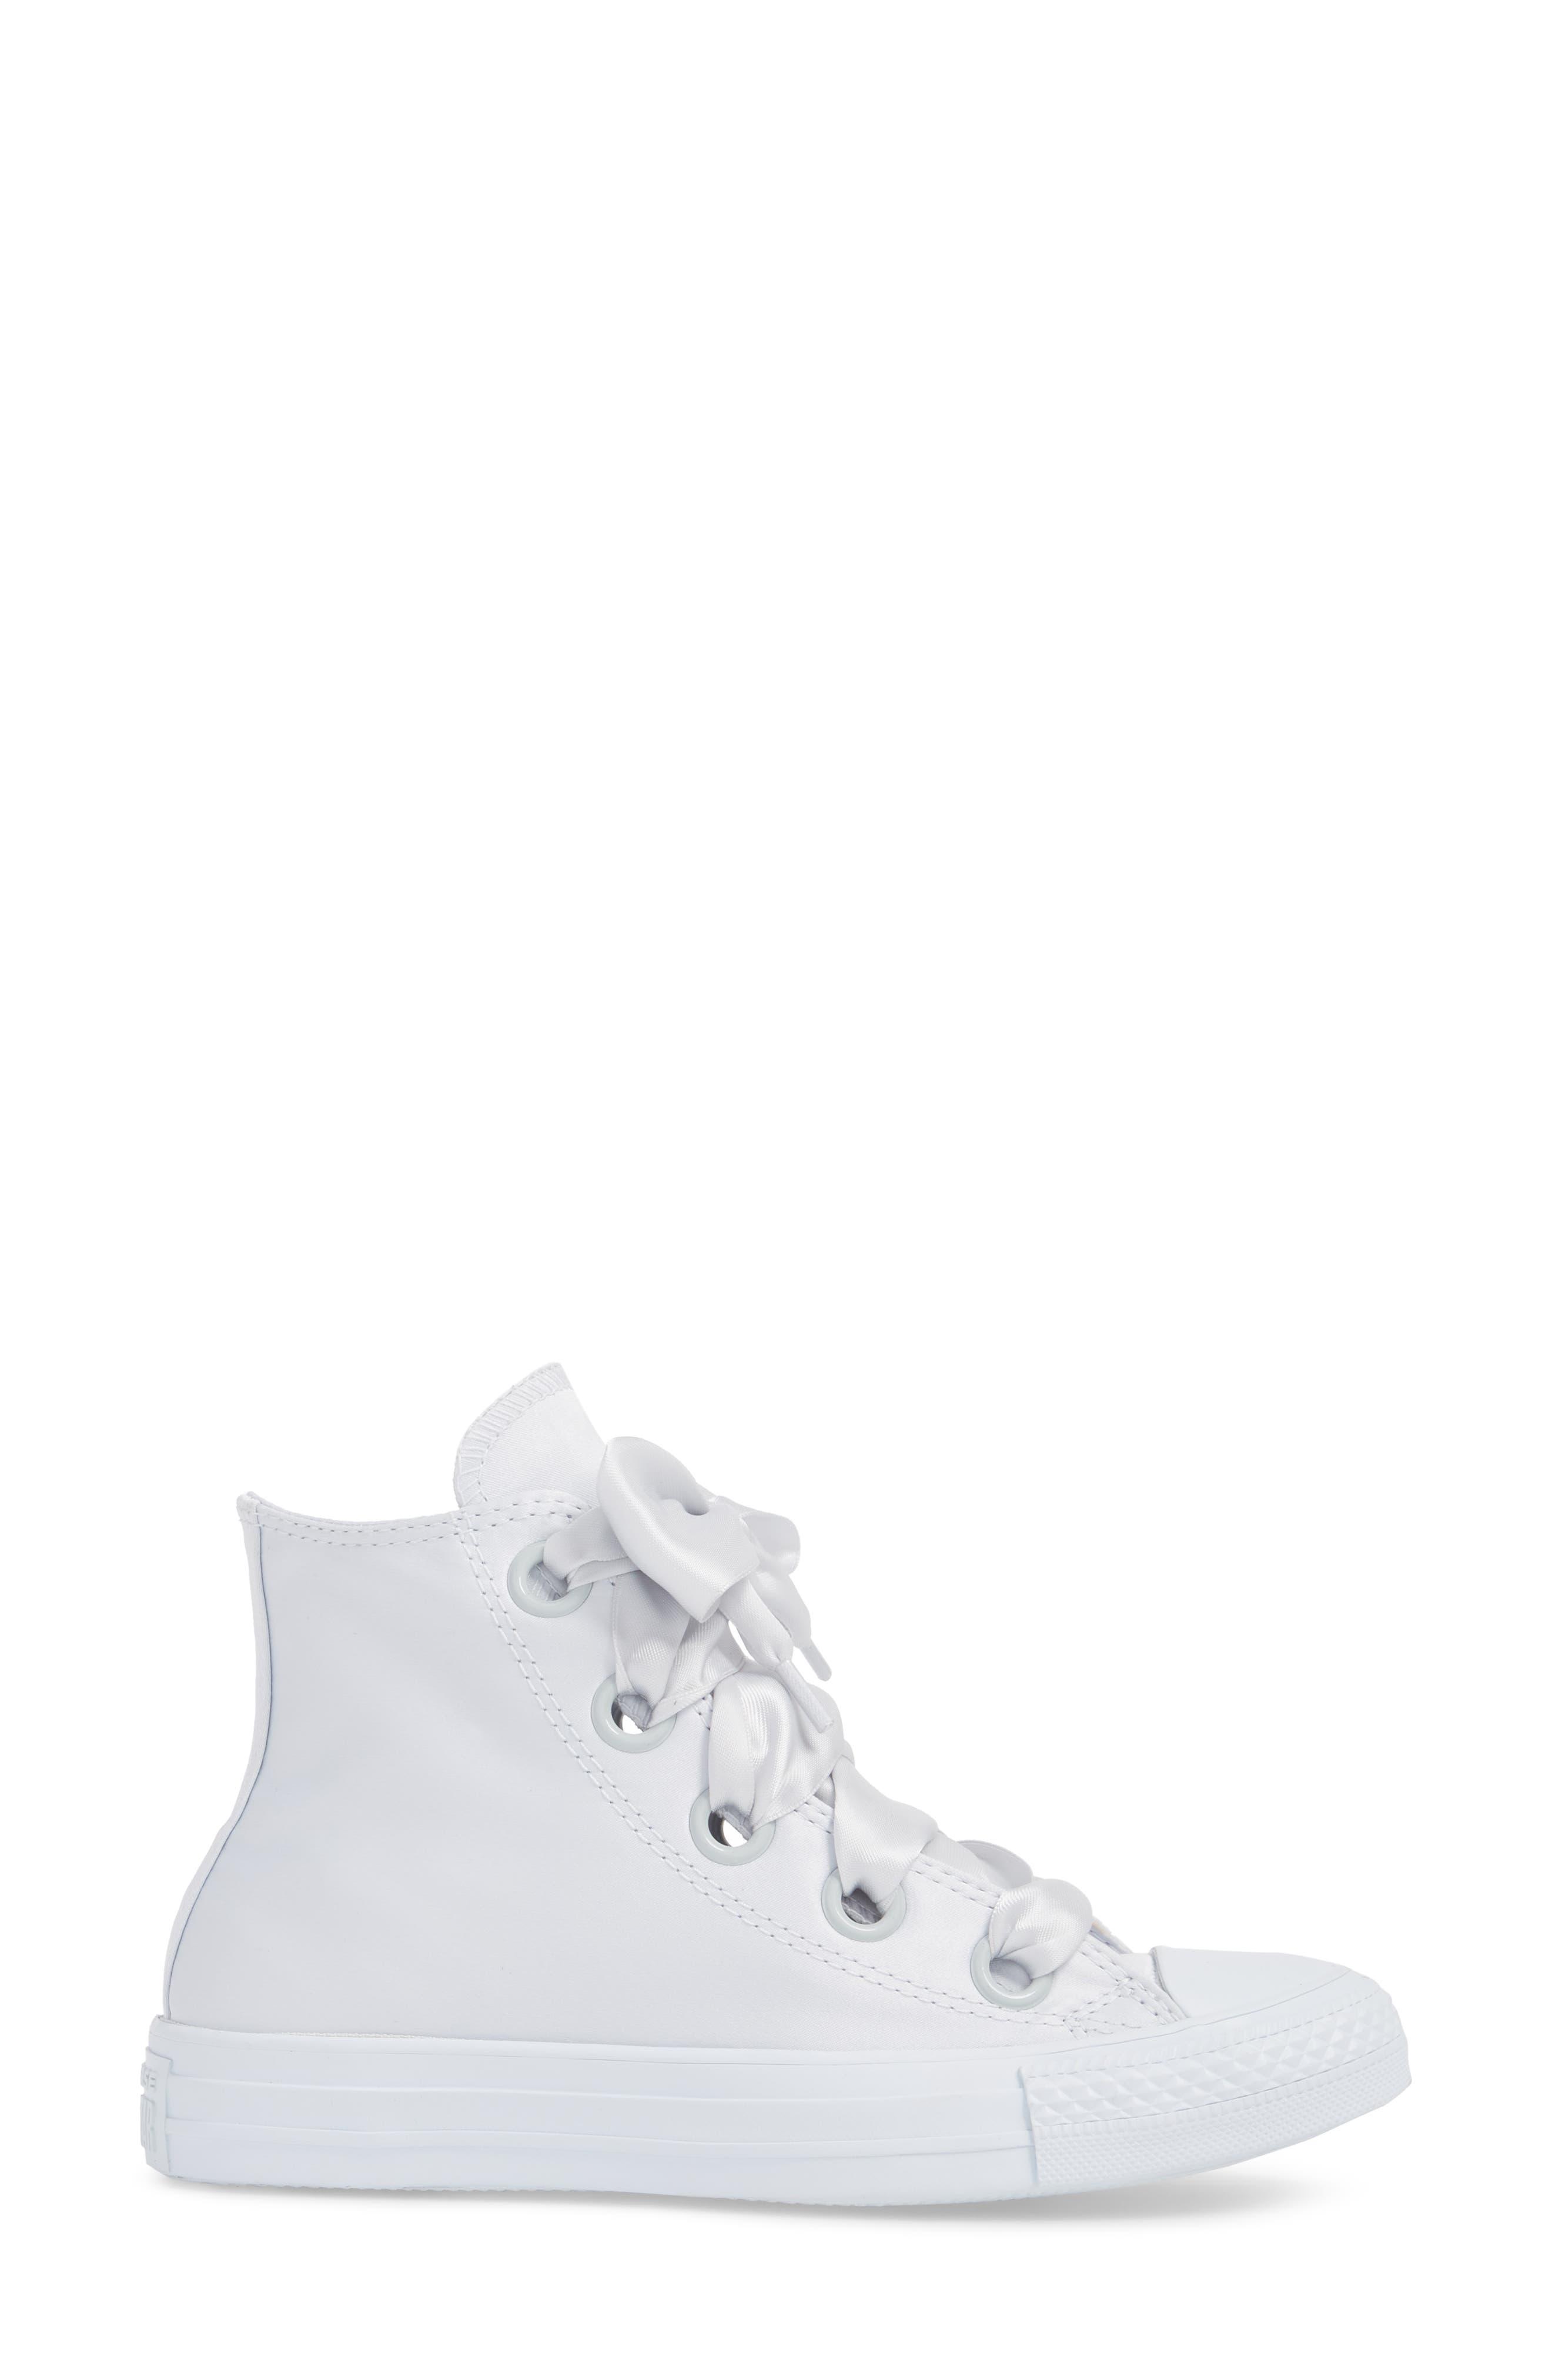 Chuck Taylor<sup>®</sup> All Star<sup>®</sup> Big Eyelet High Top Sneaker,                             Alternate thumbnail 3, color,                             Platinum